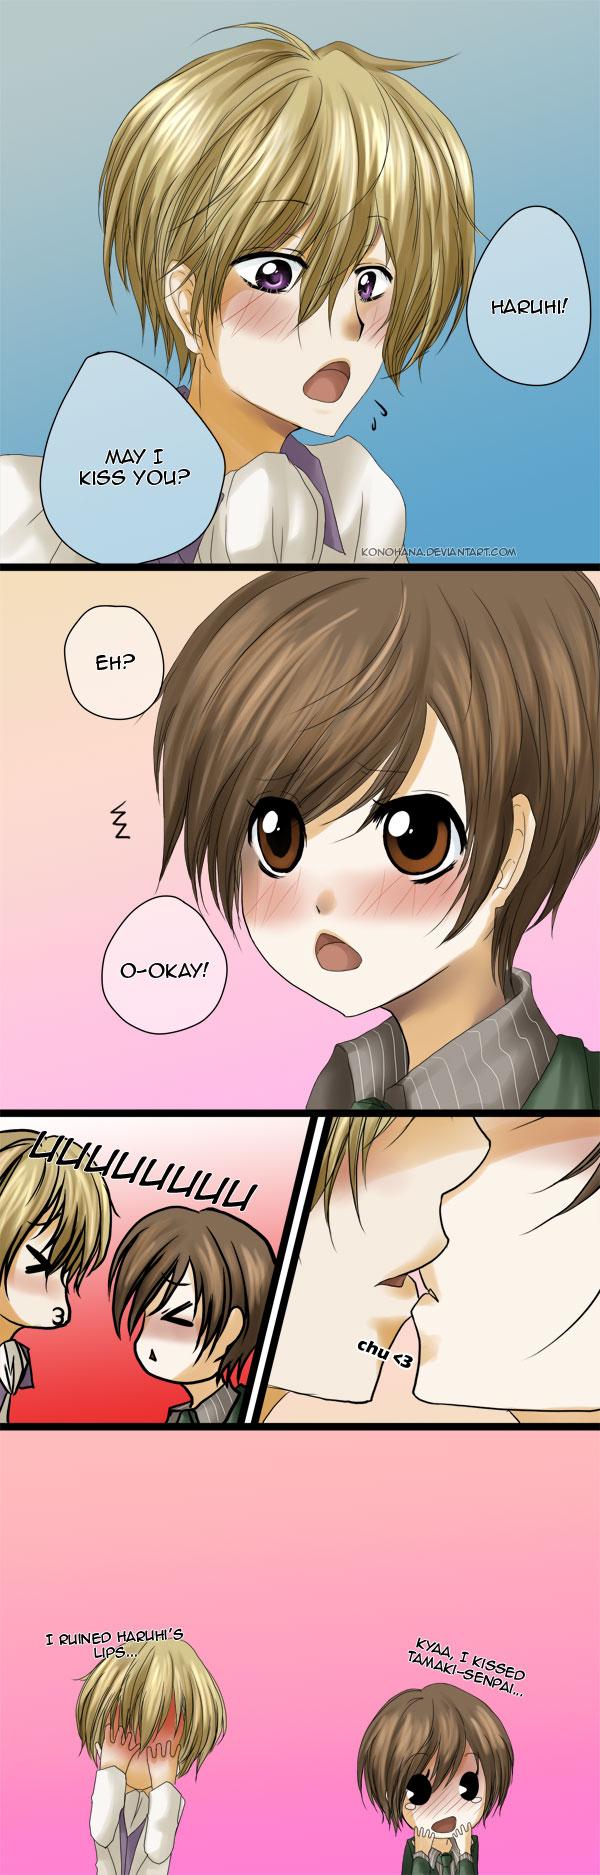 Haruhi  may I kiss you...